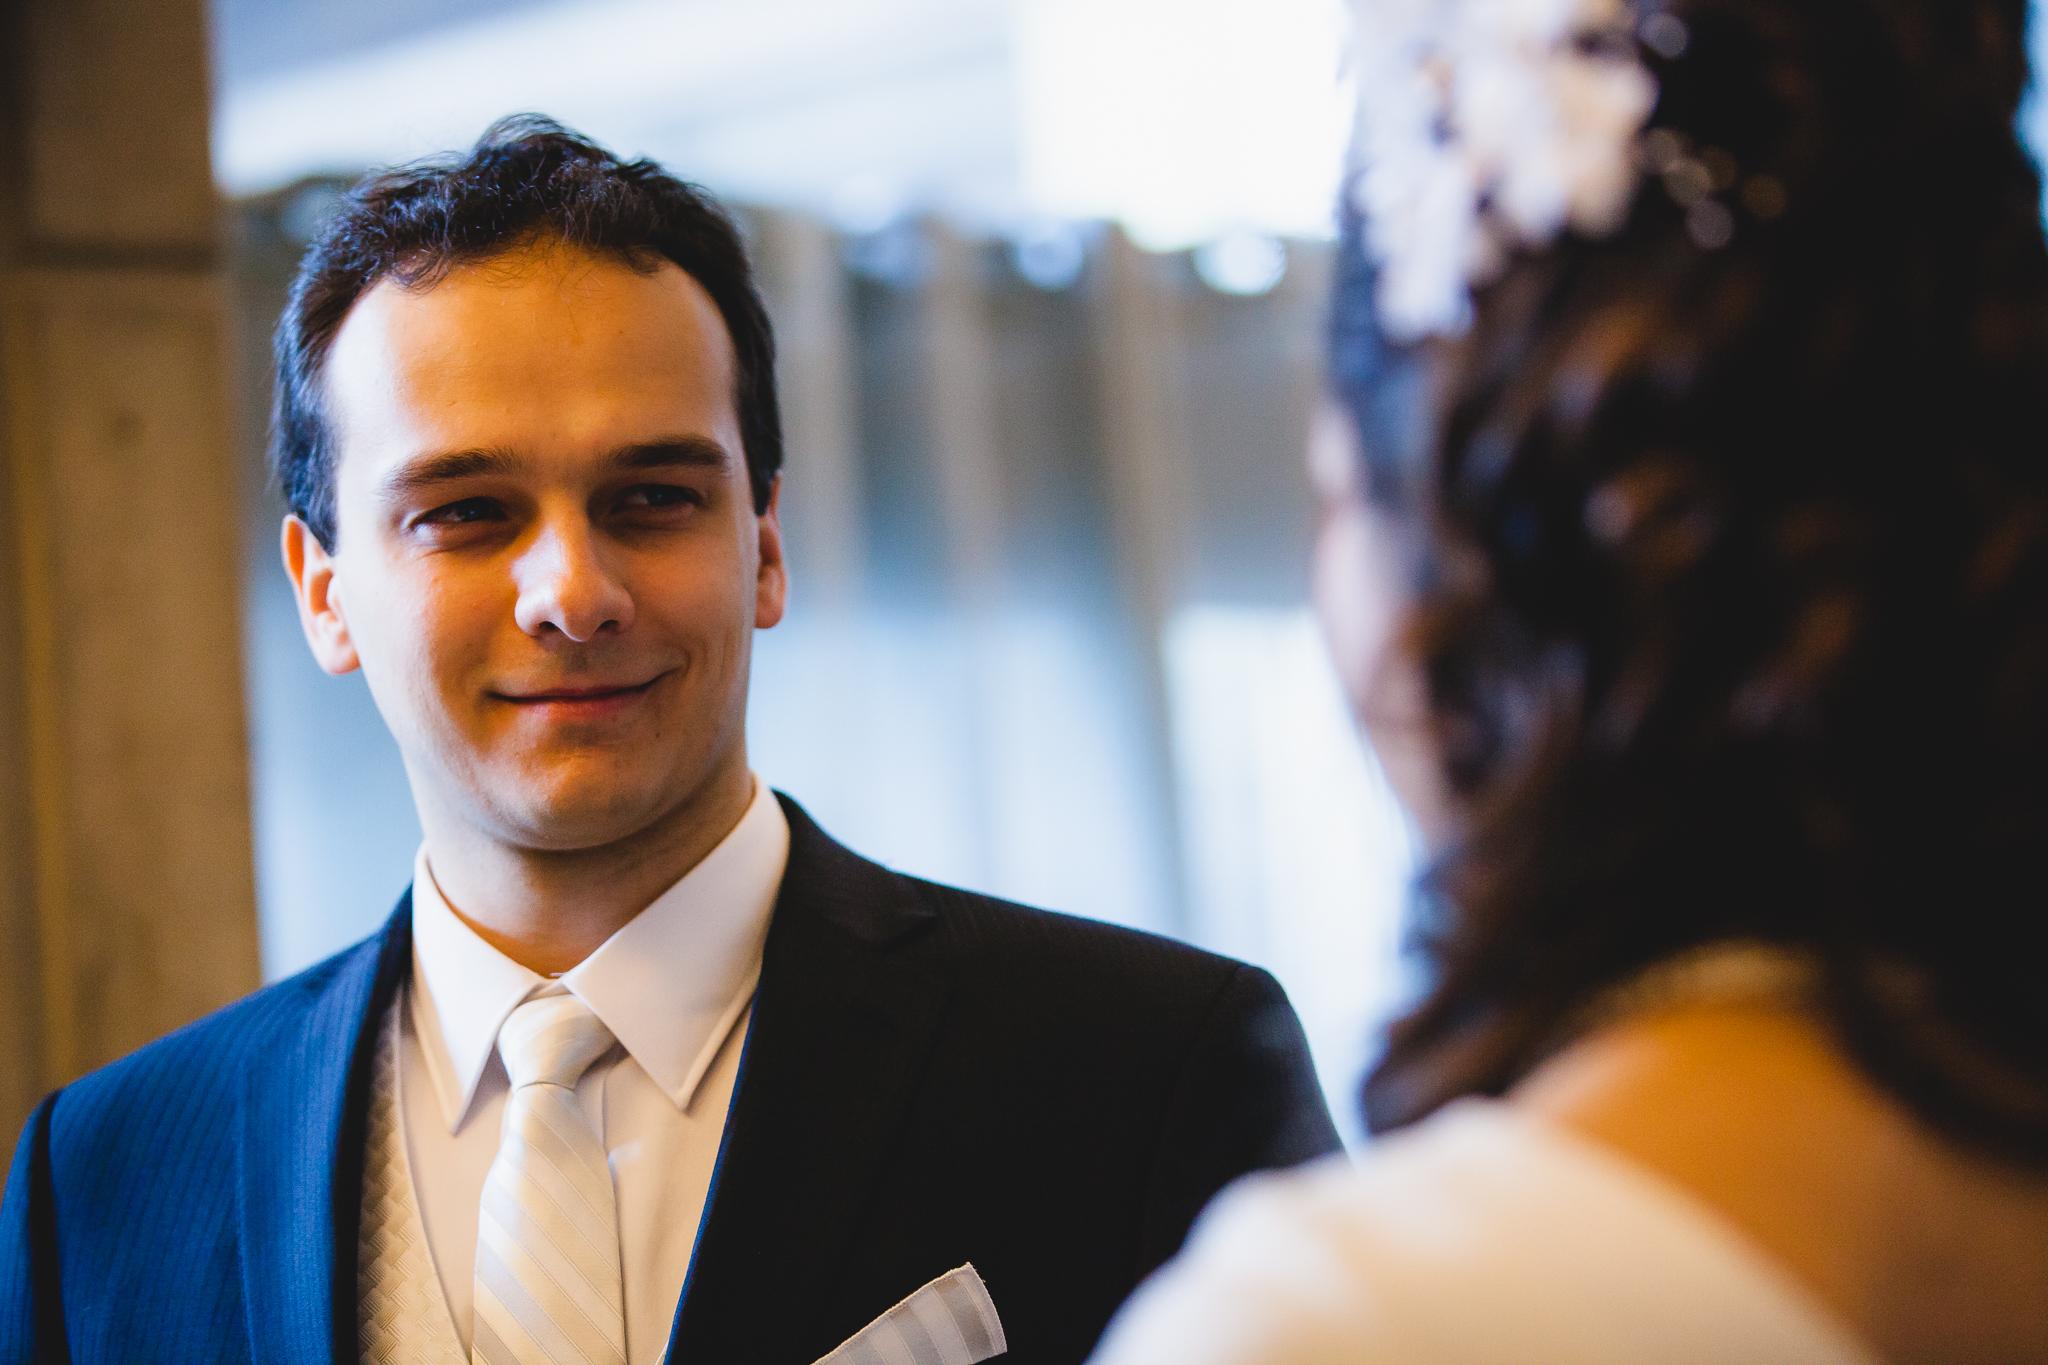 Toronto Wedding Photography - Zoya & Alexei -17.jpg